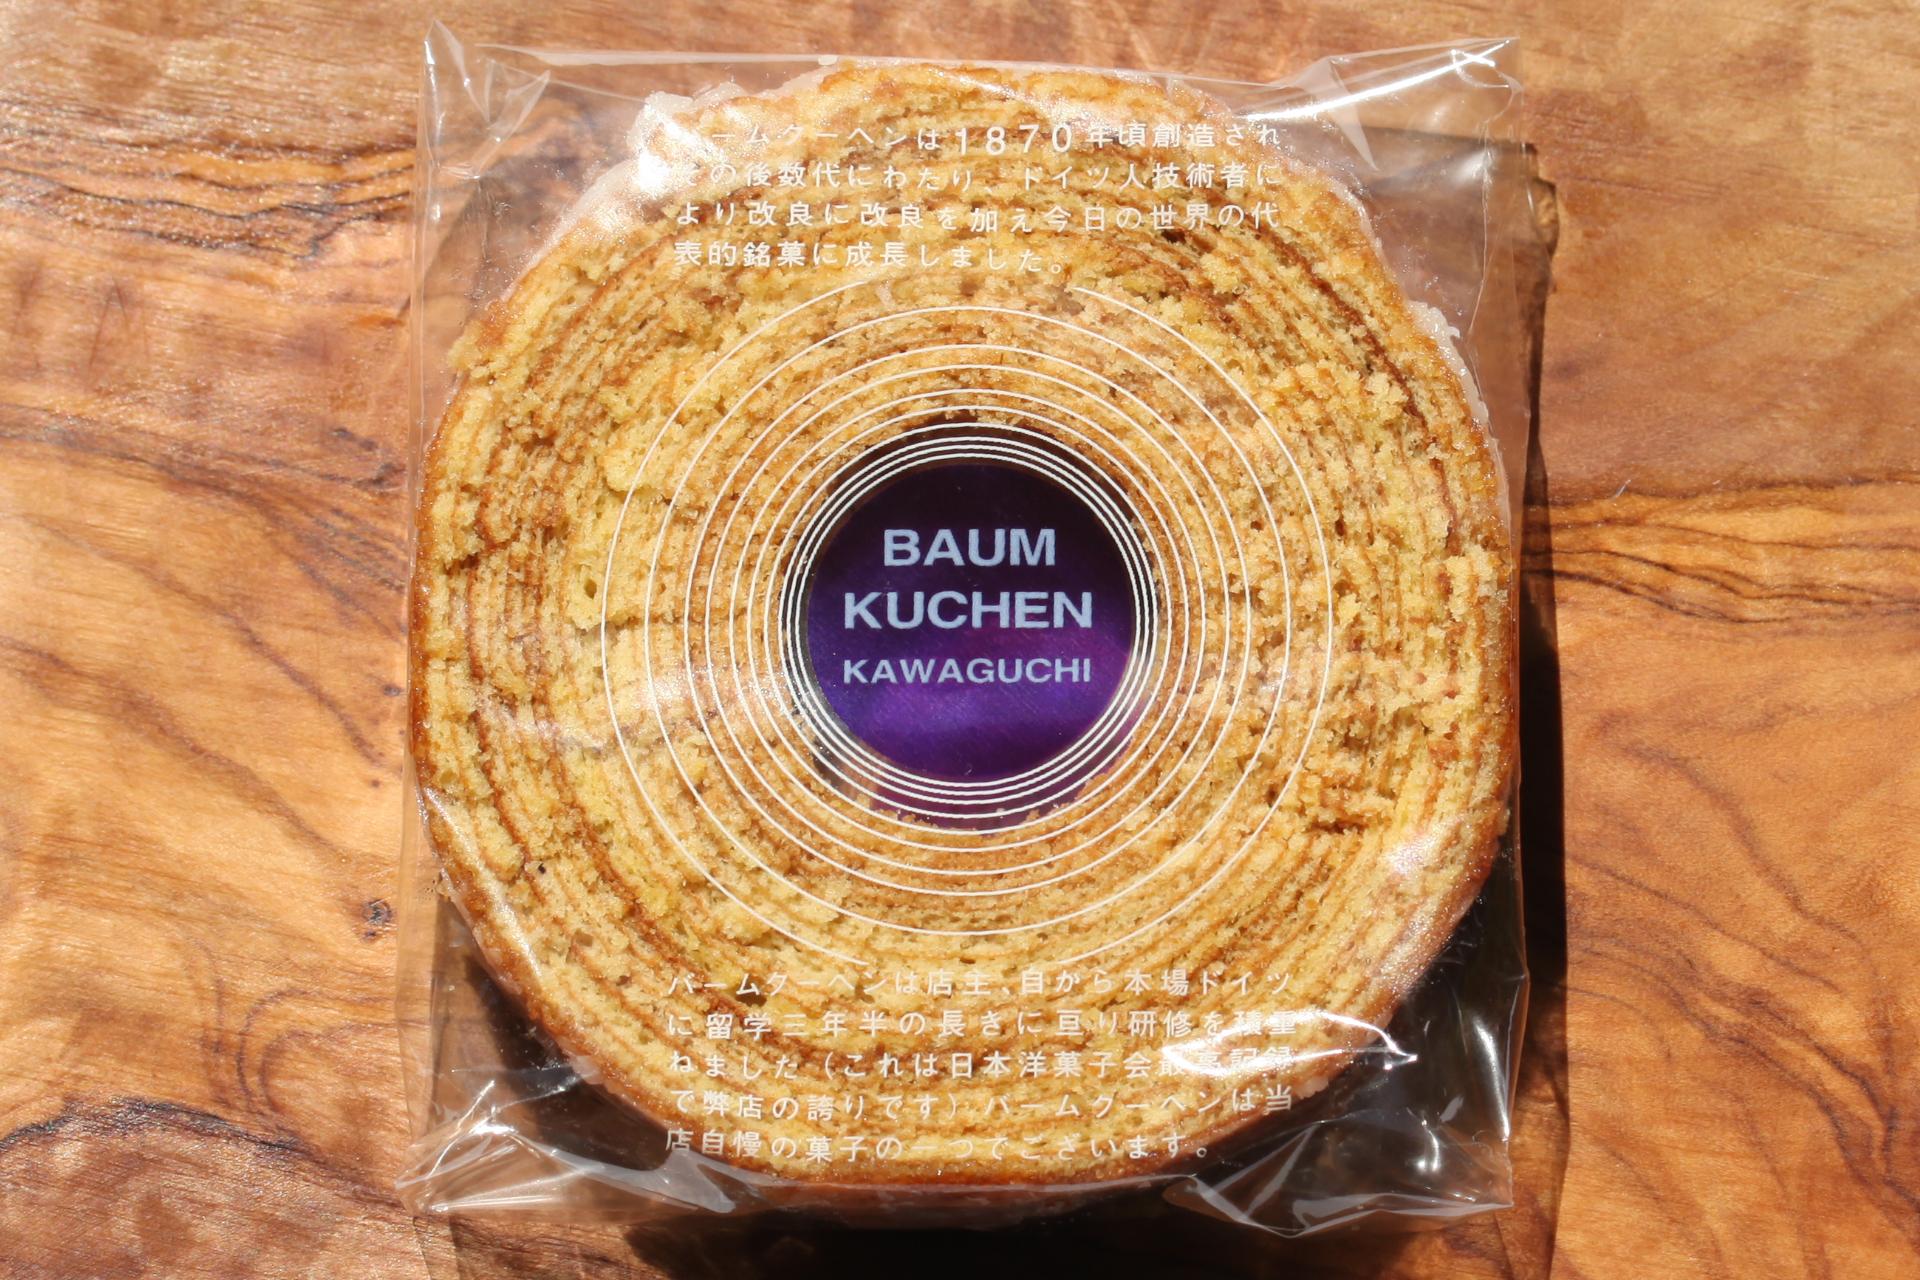 kk-baumkuchen-s